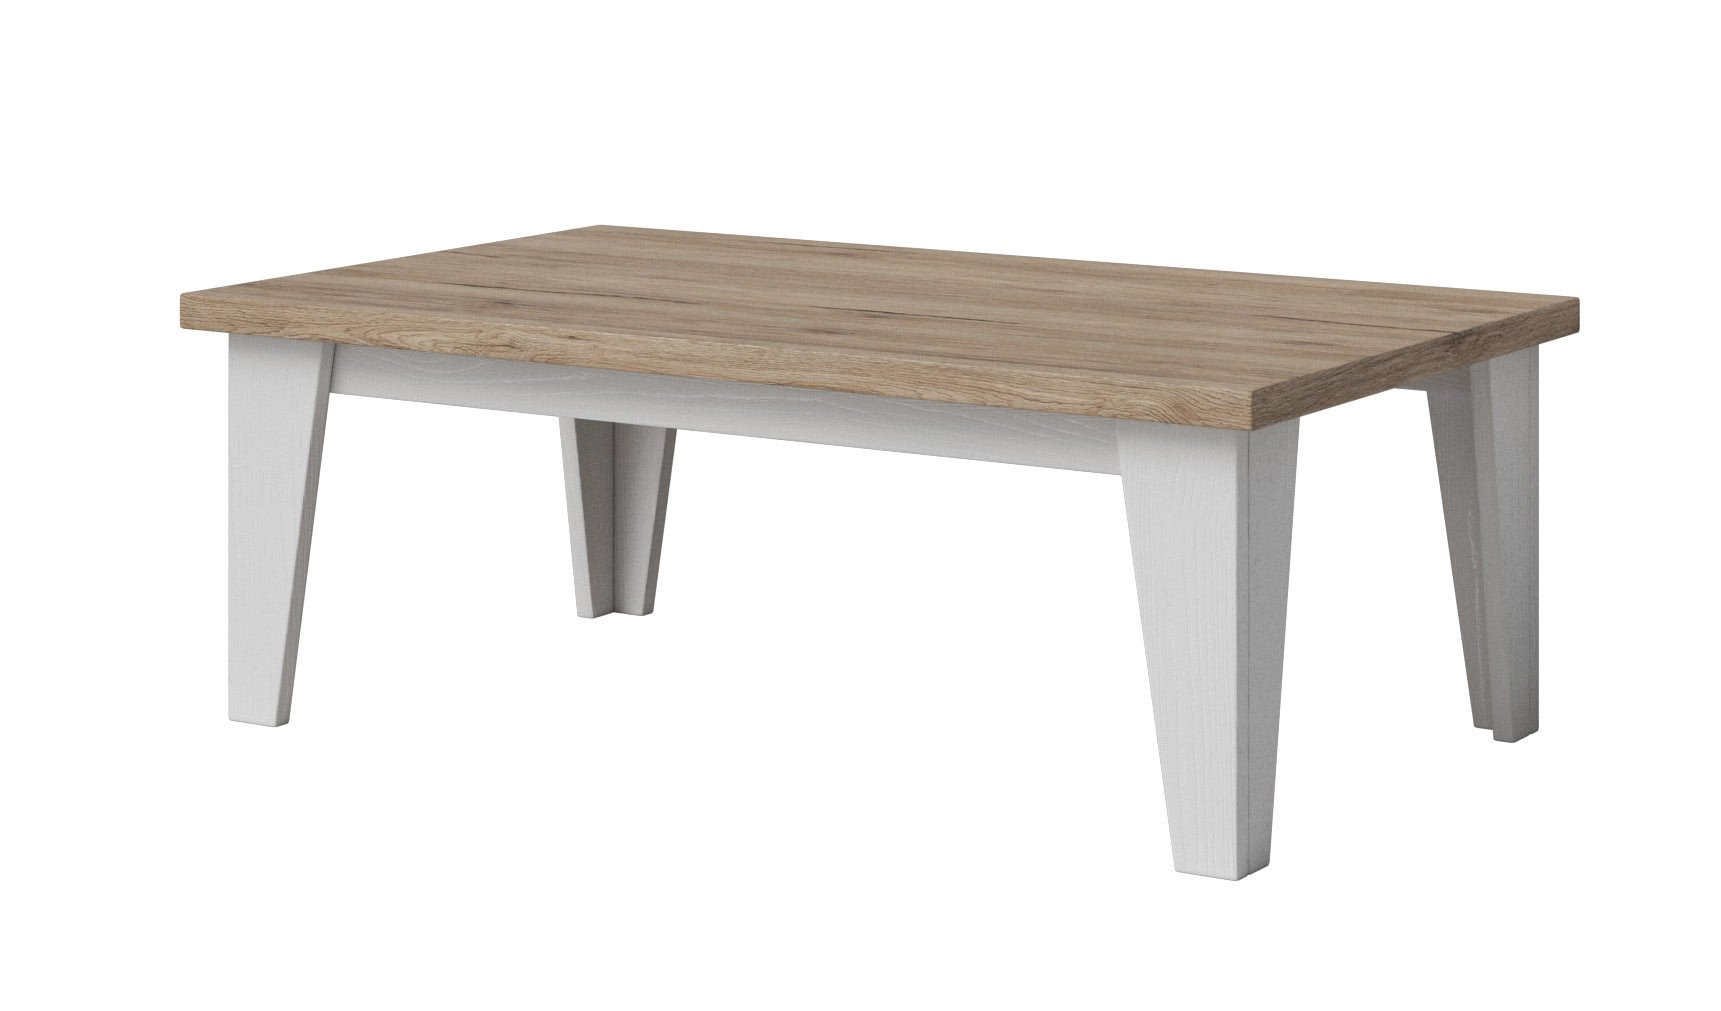 Table basse scandinave chêne/blanc veiné mat Melanie